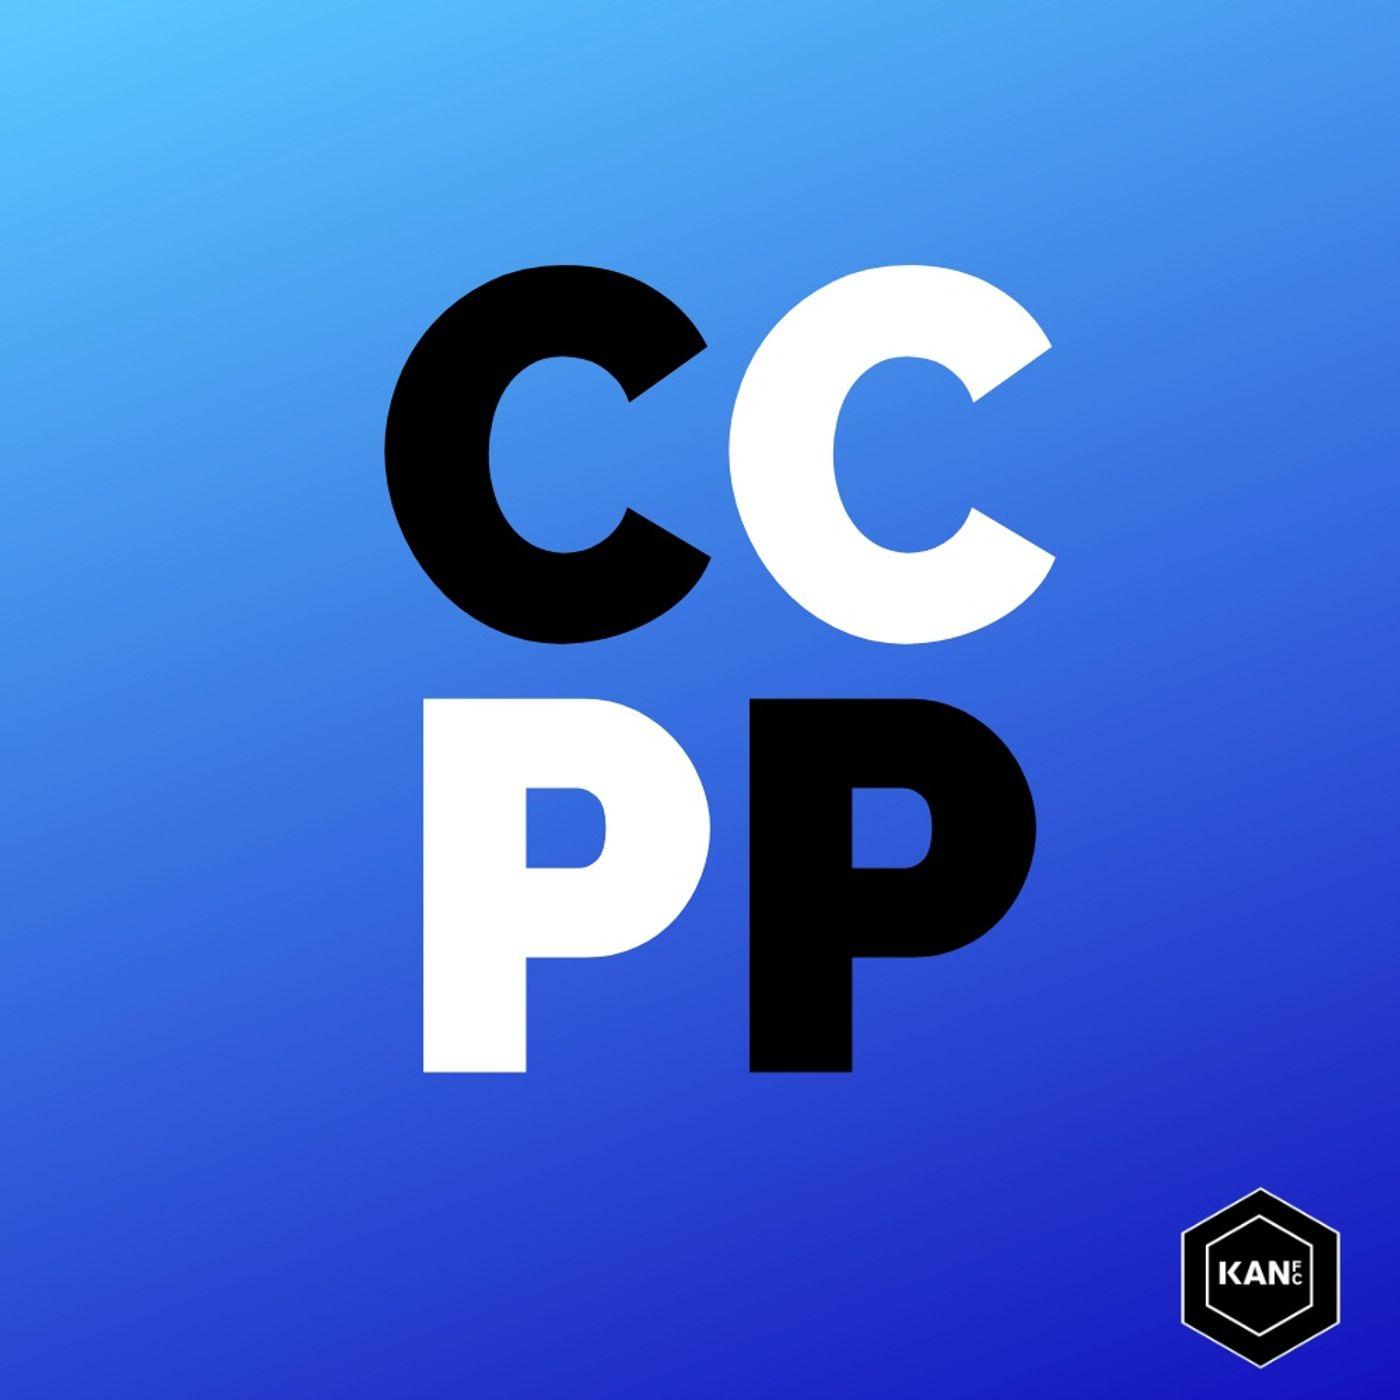 Qui sont vraiment les clowns  | CCPP (Ep. 16)